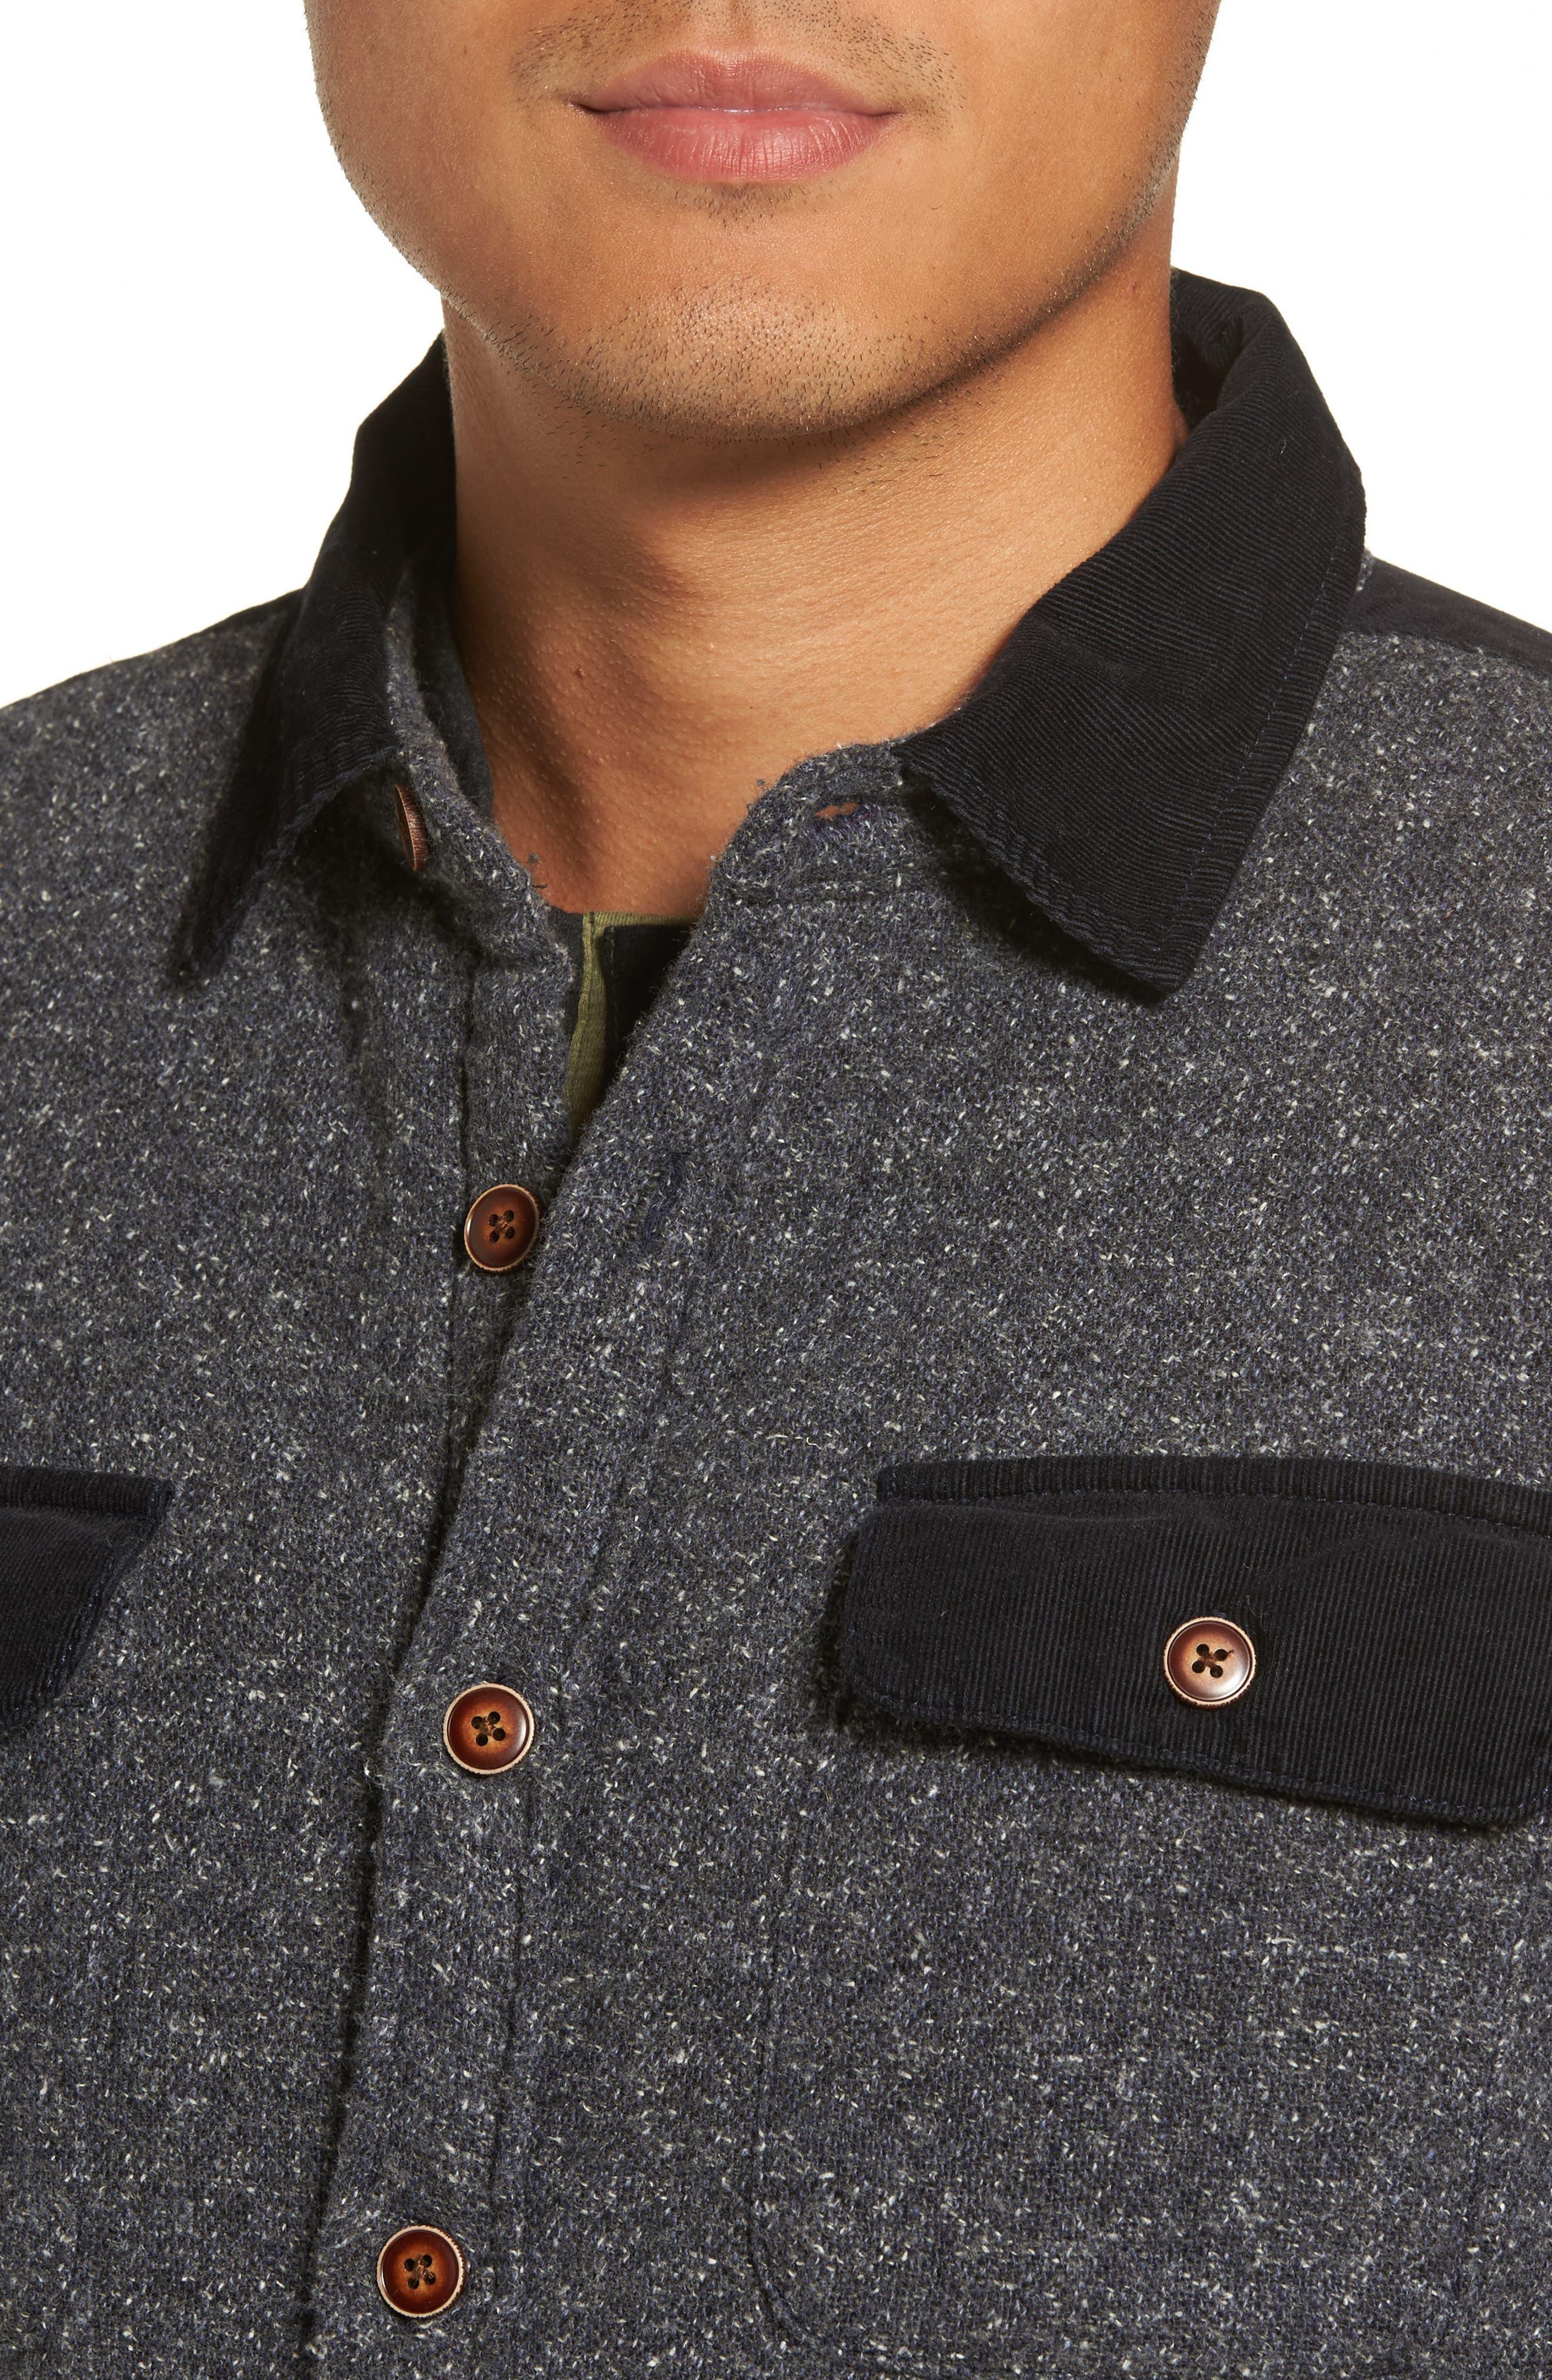 Alternate Image 3  - Nifty Genius CPO Shirt Jacket